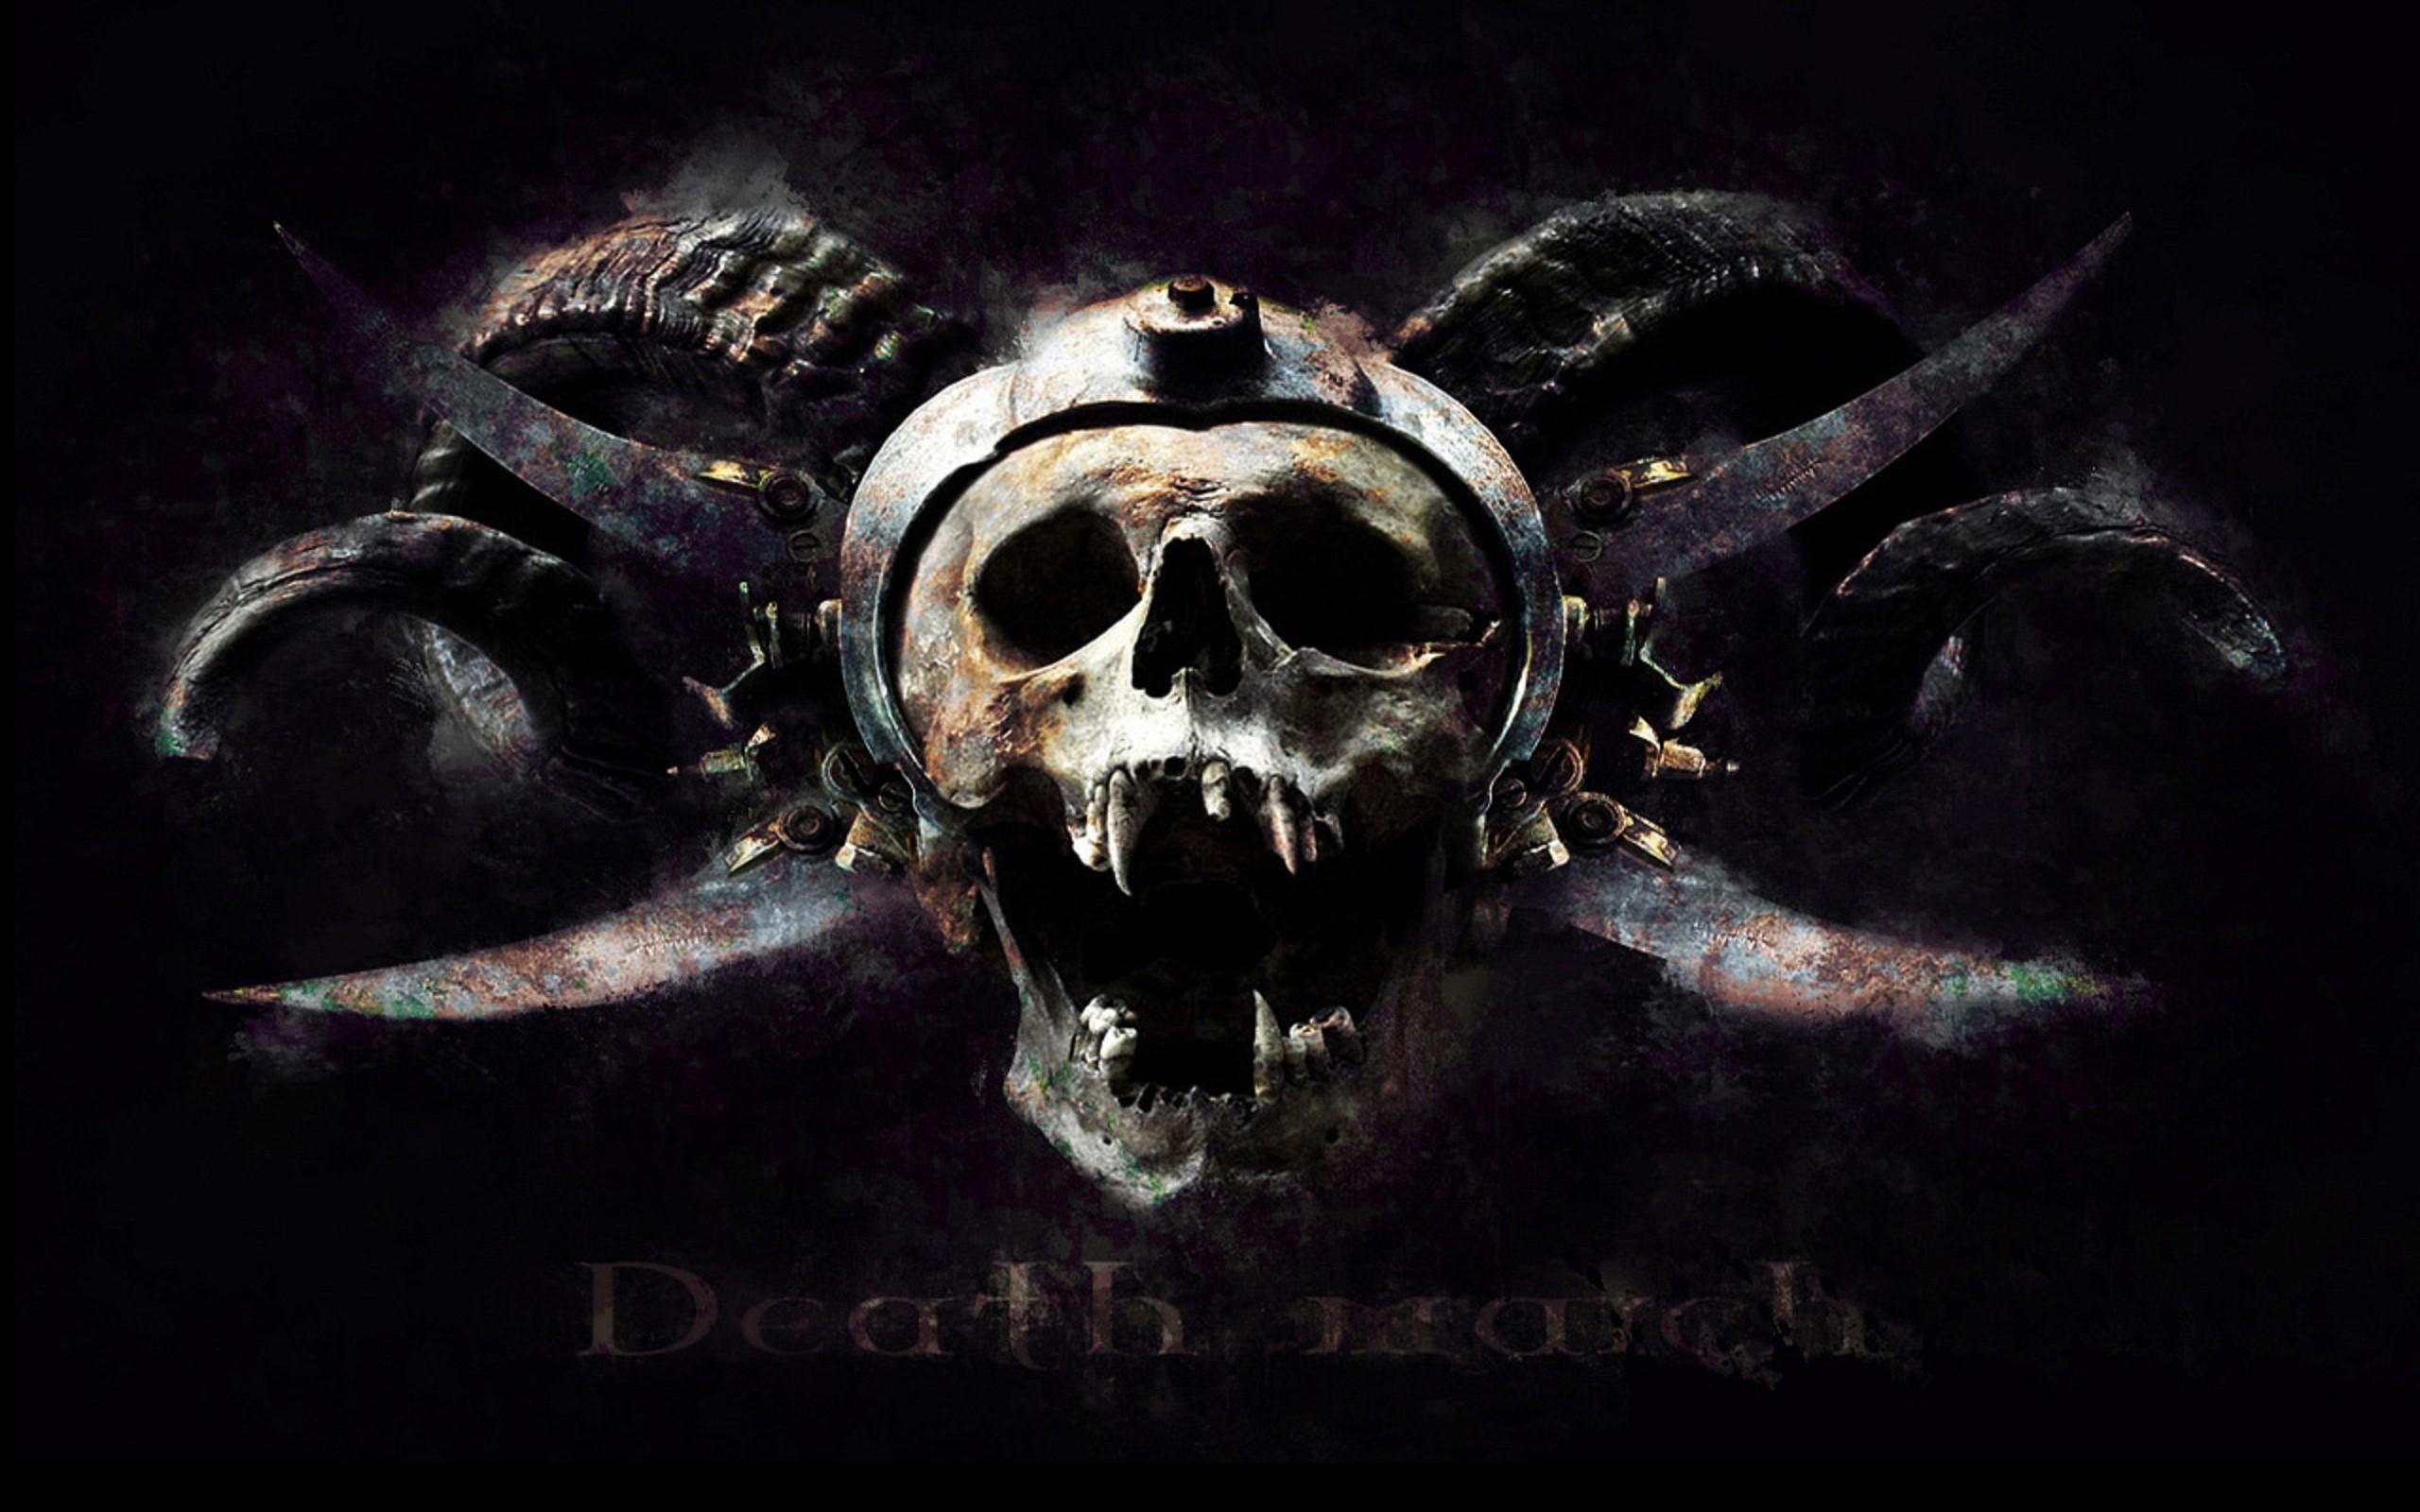 Metal music background - Skull Metal Wallpaper Skulls Metal Music Metalcamp